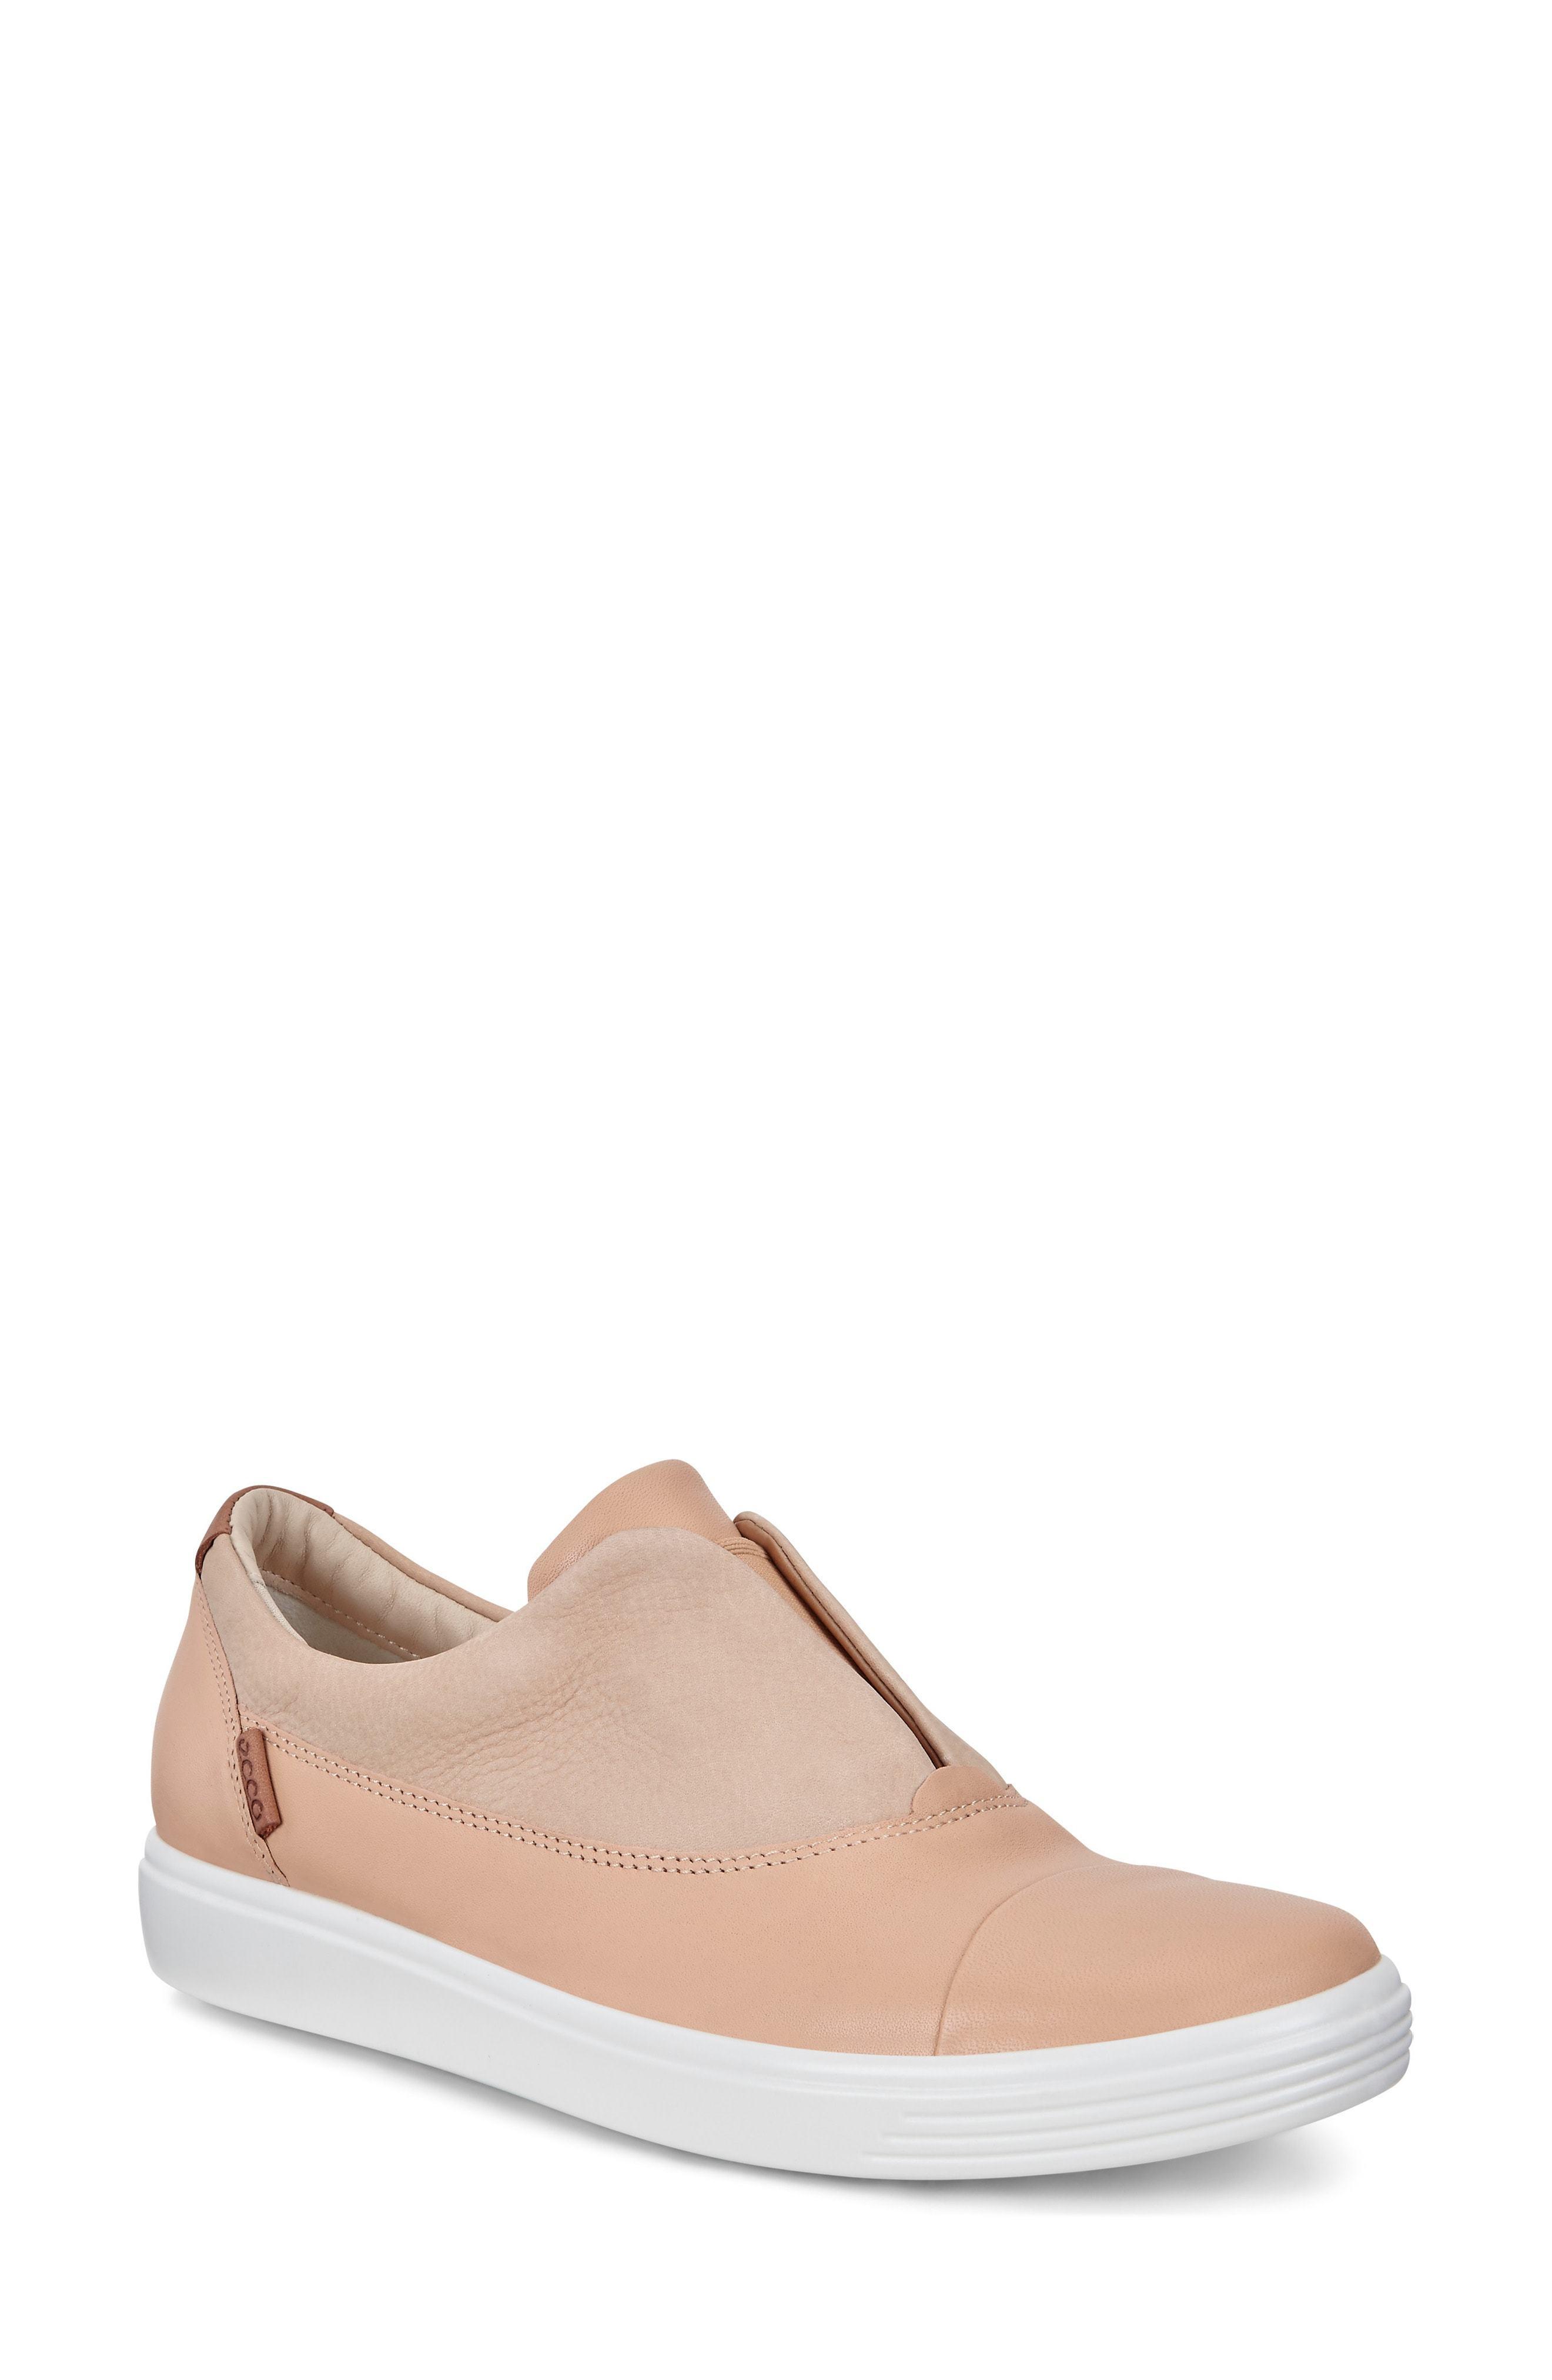 c2dc77a6c Ecco Soft 7 Ii Slip On Sneaker, $149   Nordstrom   Lookastic.com